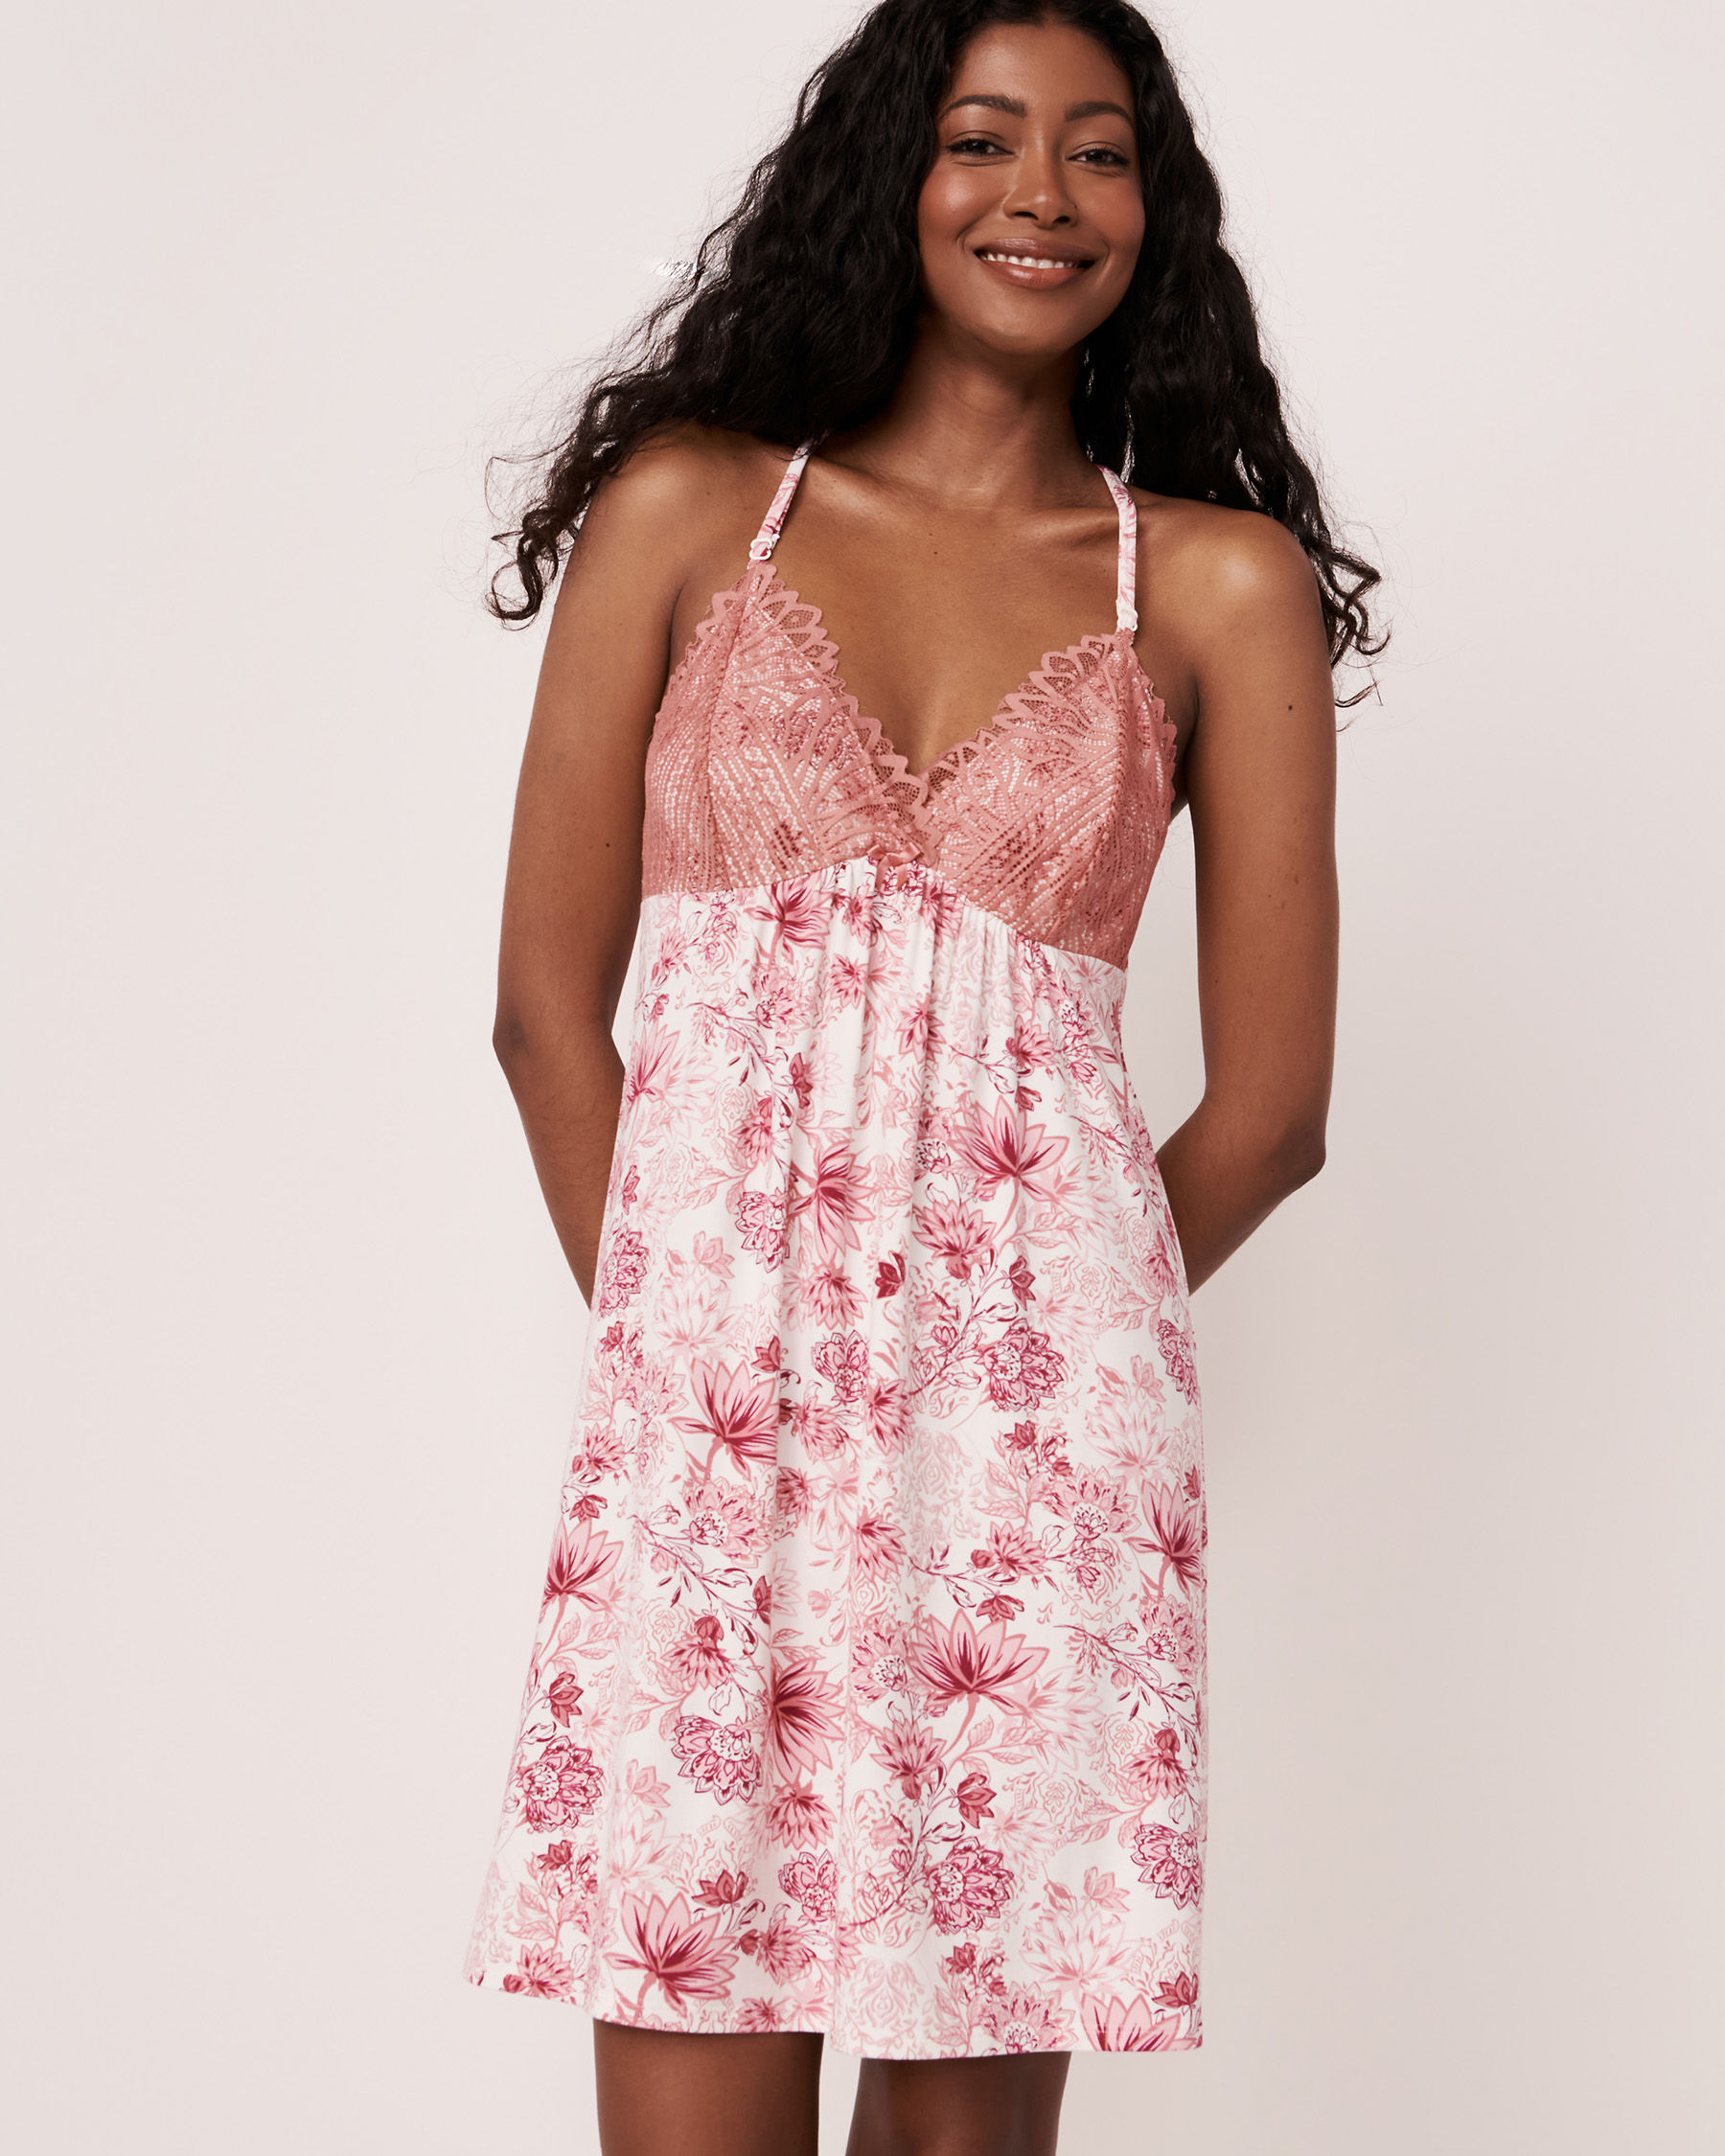 LA VIE EN ROSE Lace Trim Modal Nightie Pink flowers 40500064 - View1